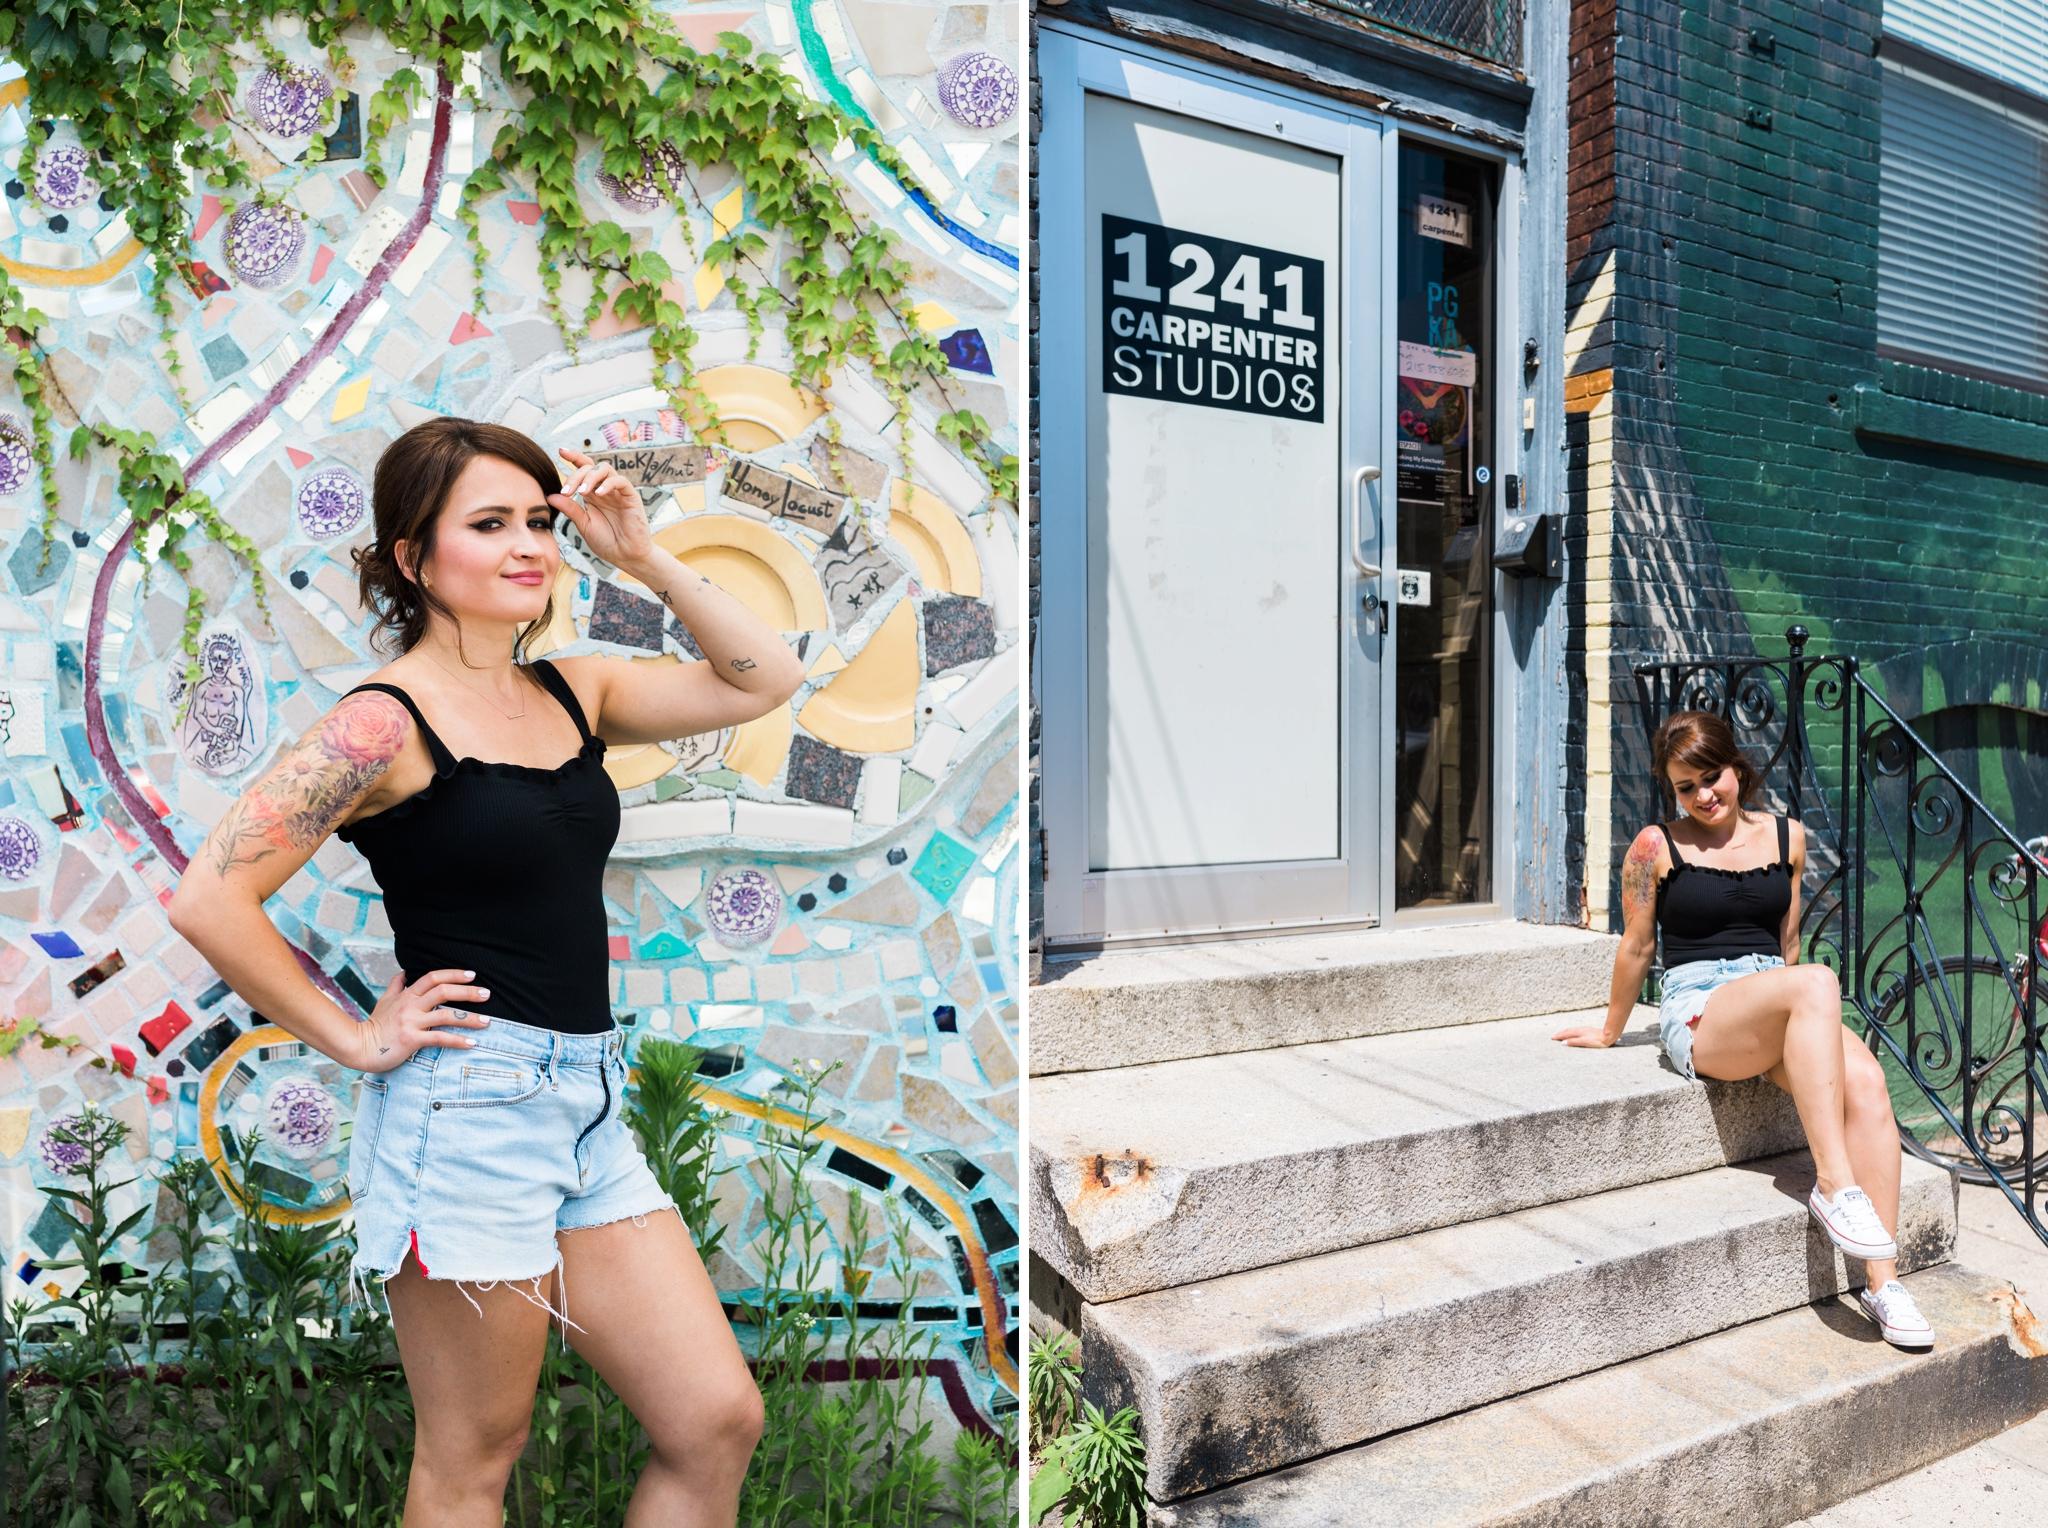 Emily Grace Photography, Lancaster PA Brand Photographer, Philly Based Artist Portrait, Ekaterina Popova, Create! Magazine, 1241 Carpenter Studios, Artspace 1241